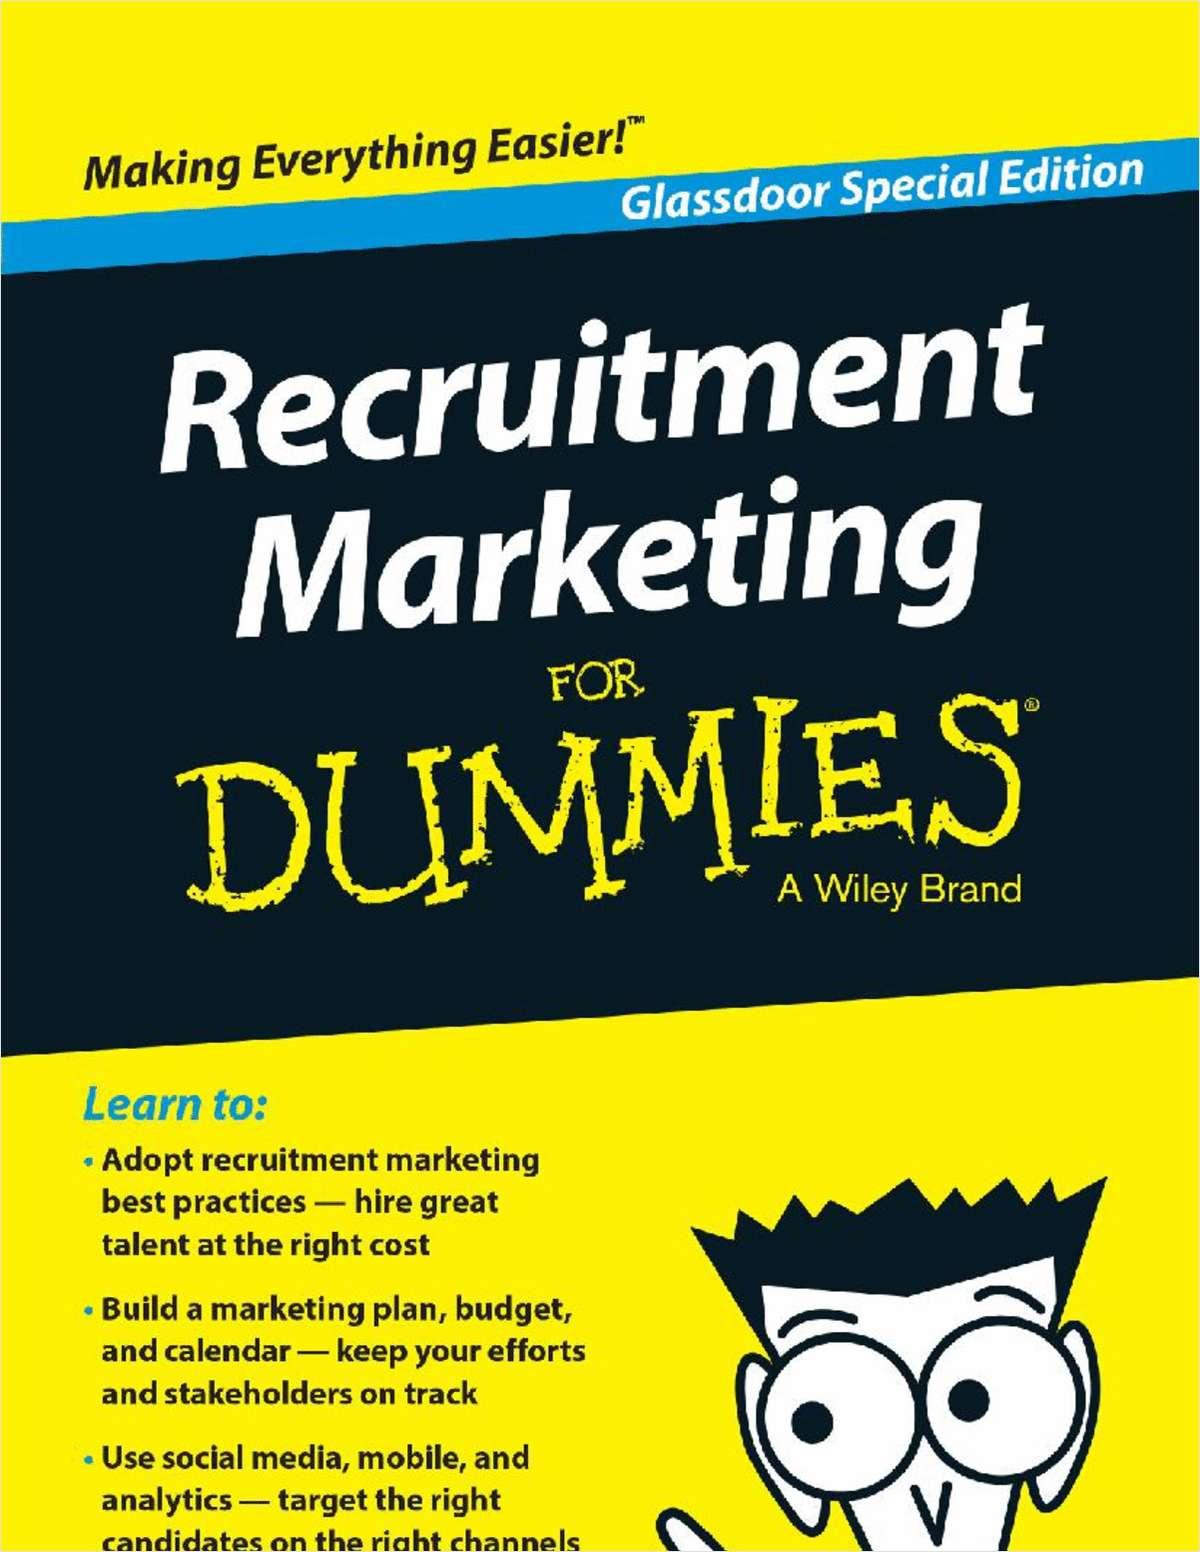 Recruitment Marketing For Dummies®, Glassdoor Special Edition